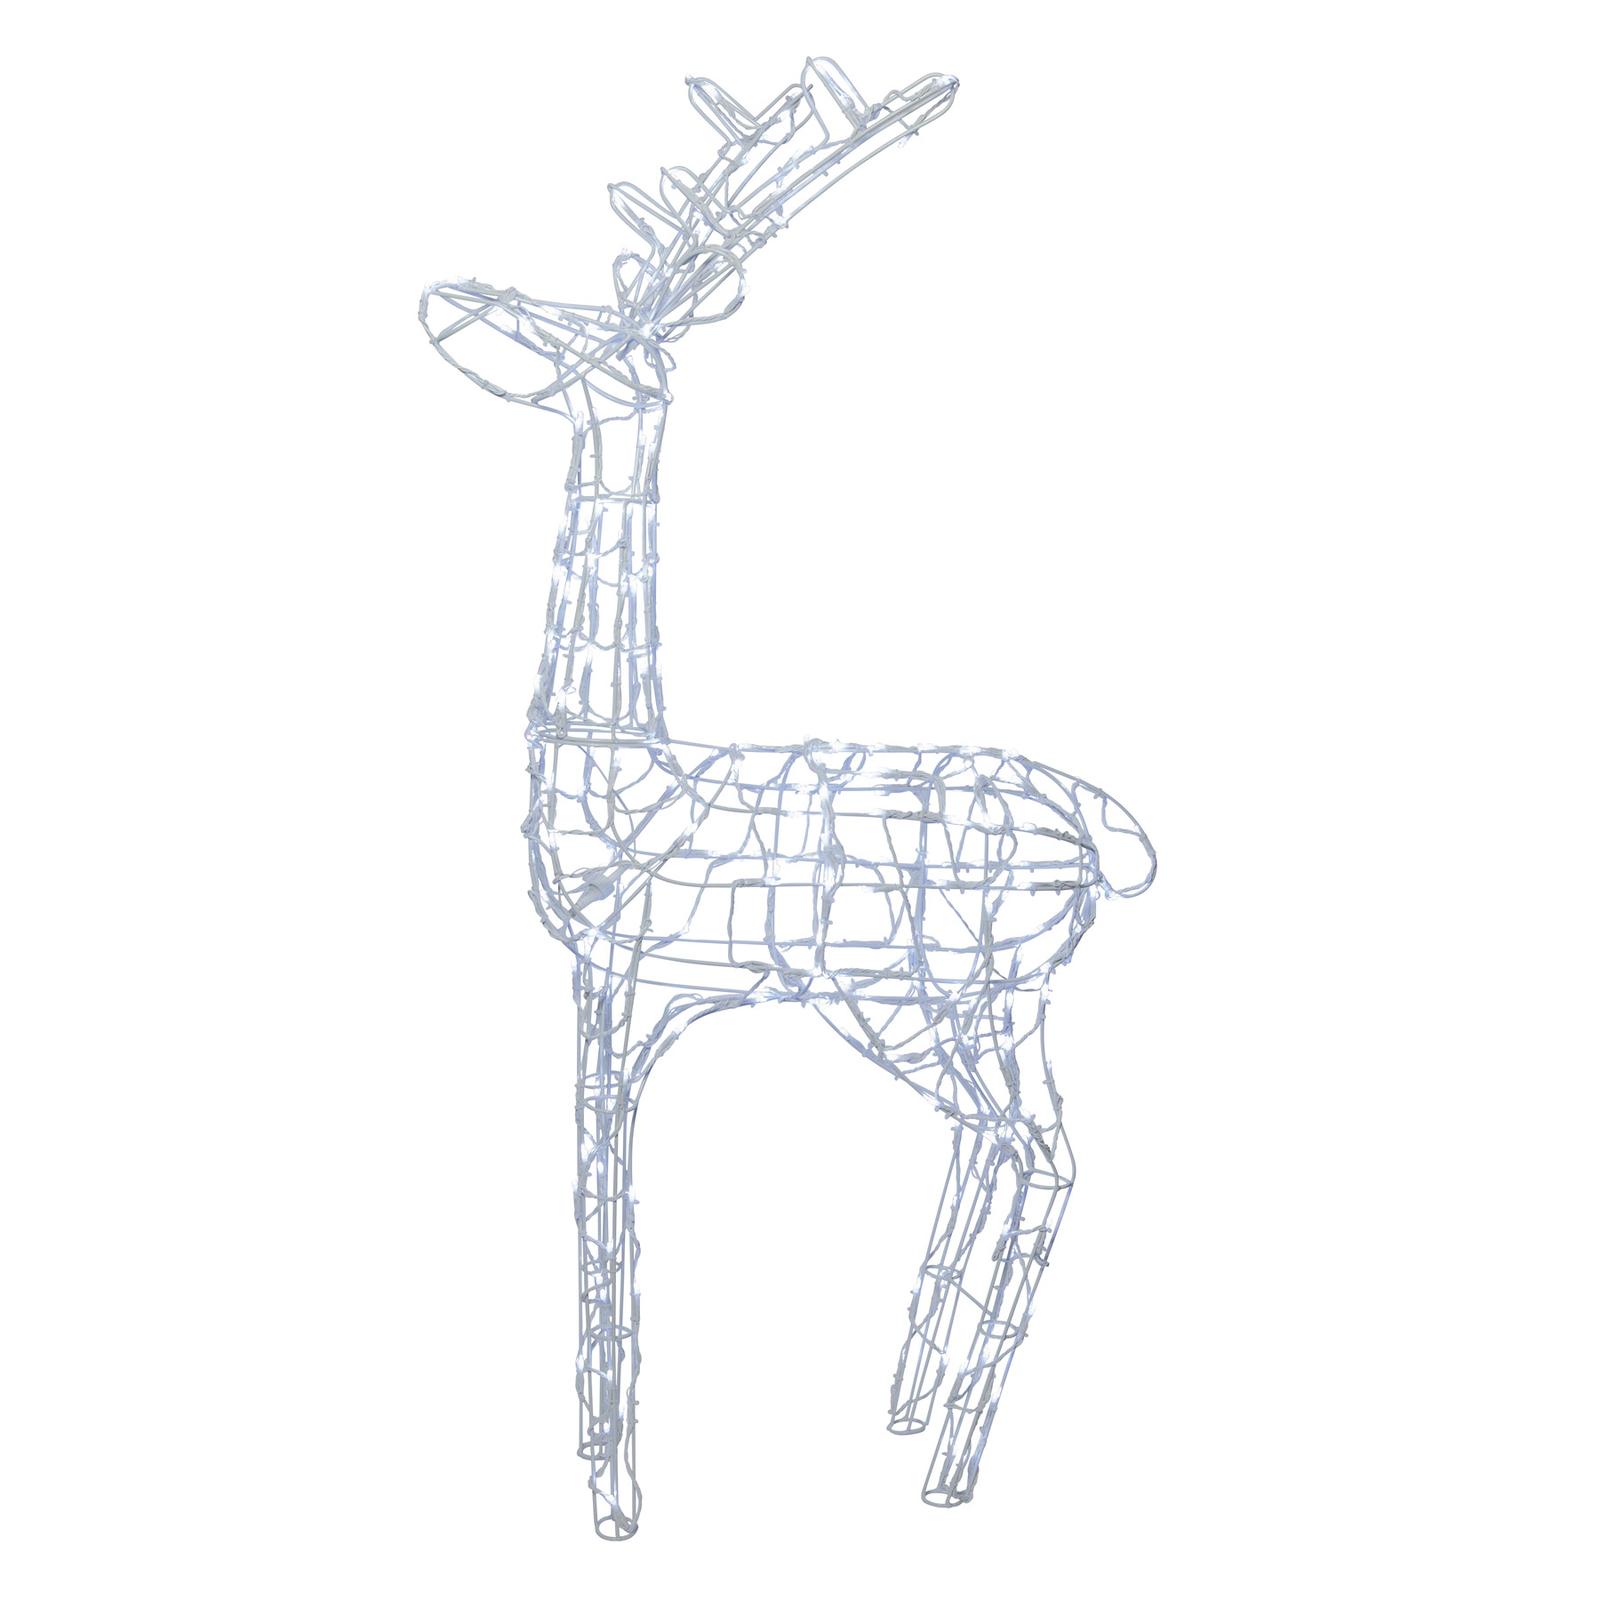 LED-Leuchtfigur Pegasus, Höhe 120 cm